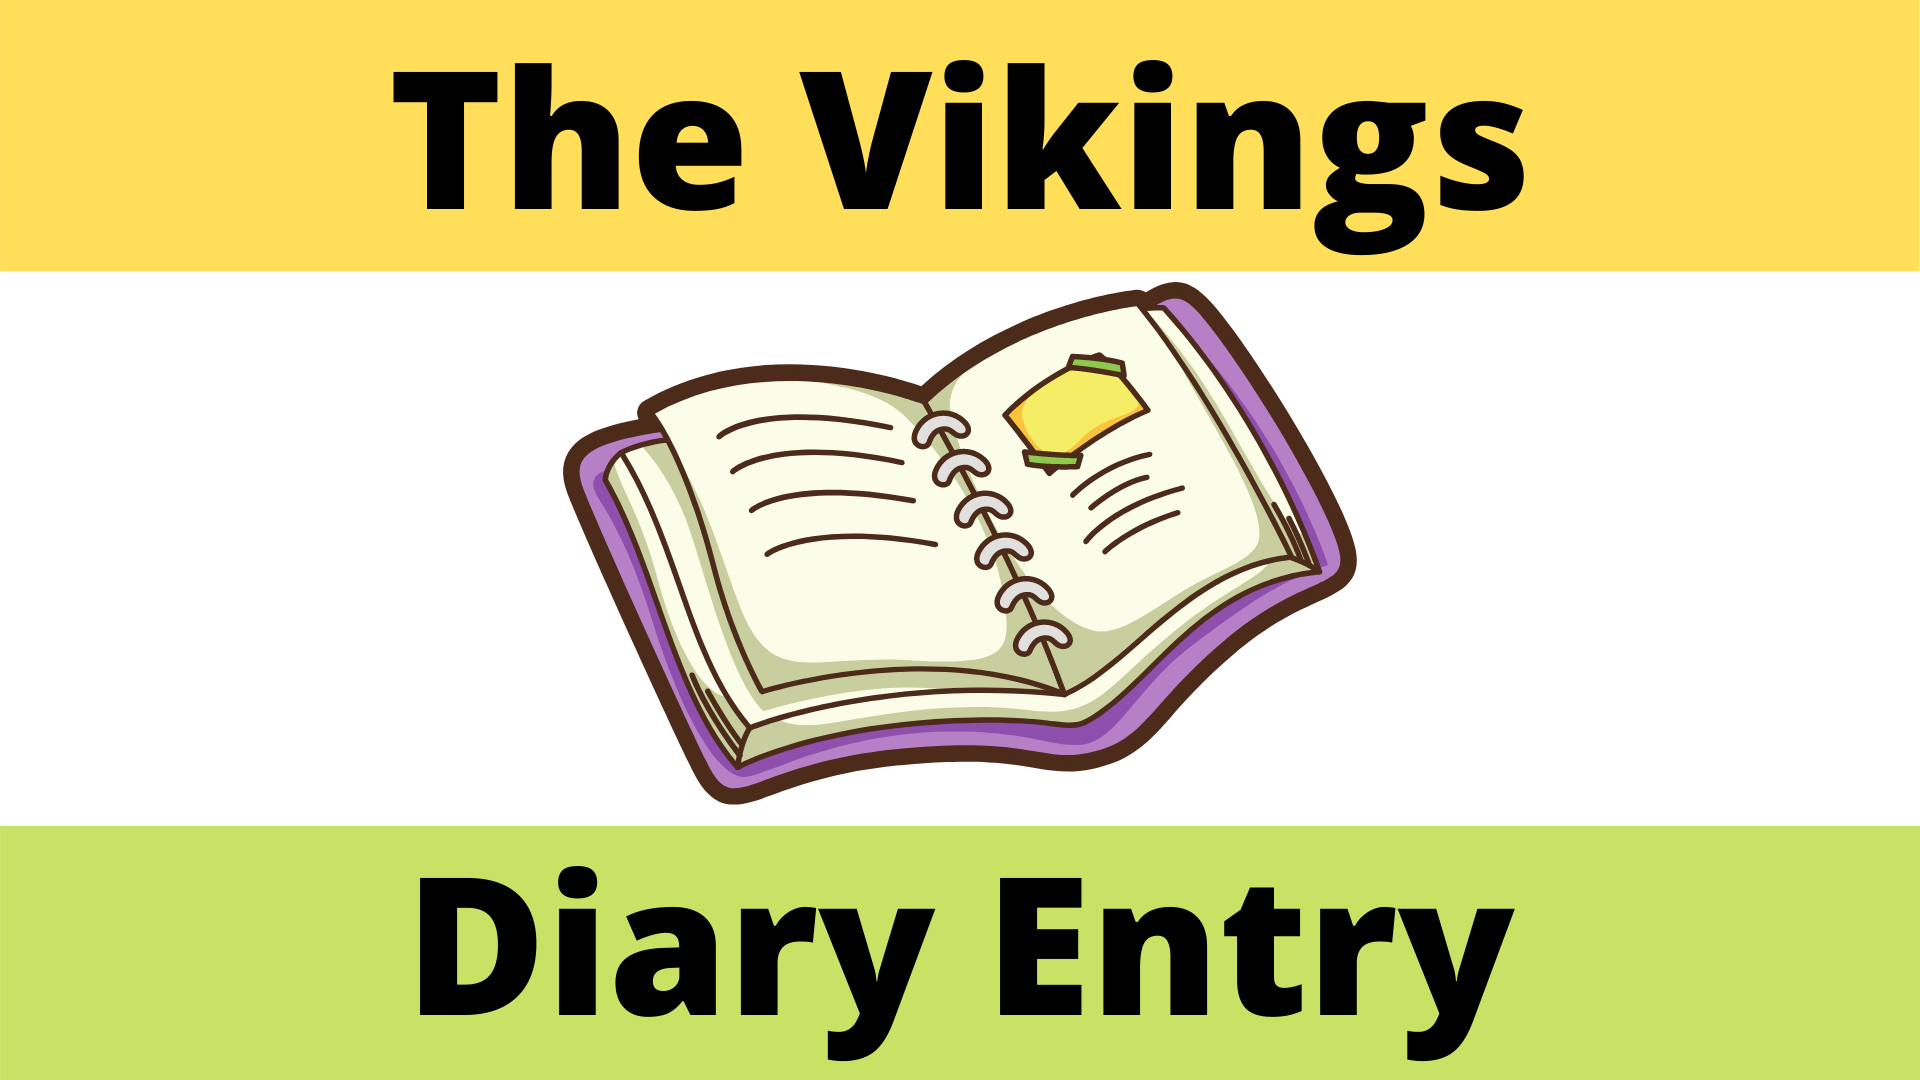 Life As A Viking Diary Entry Worksheet